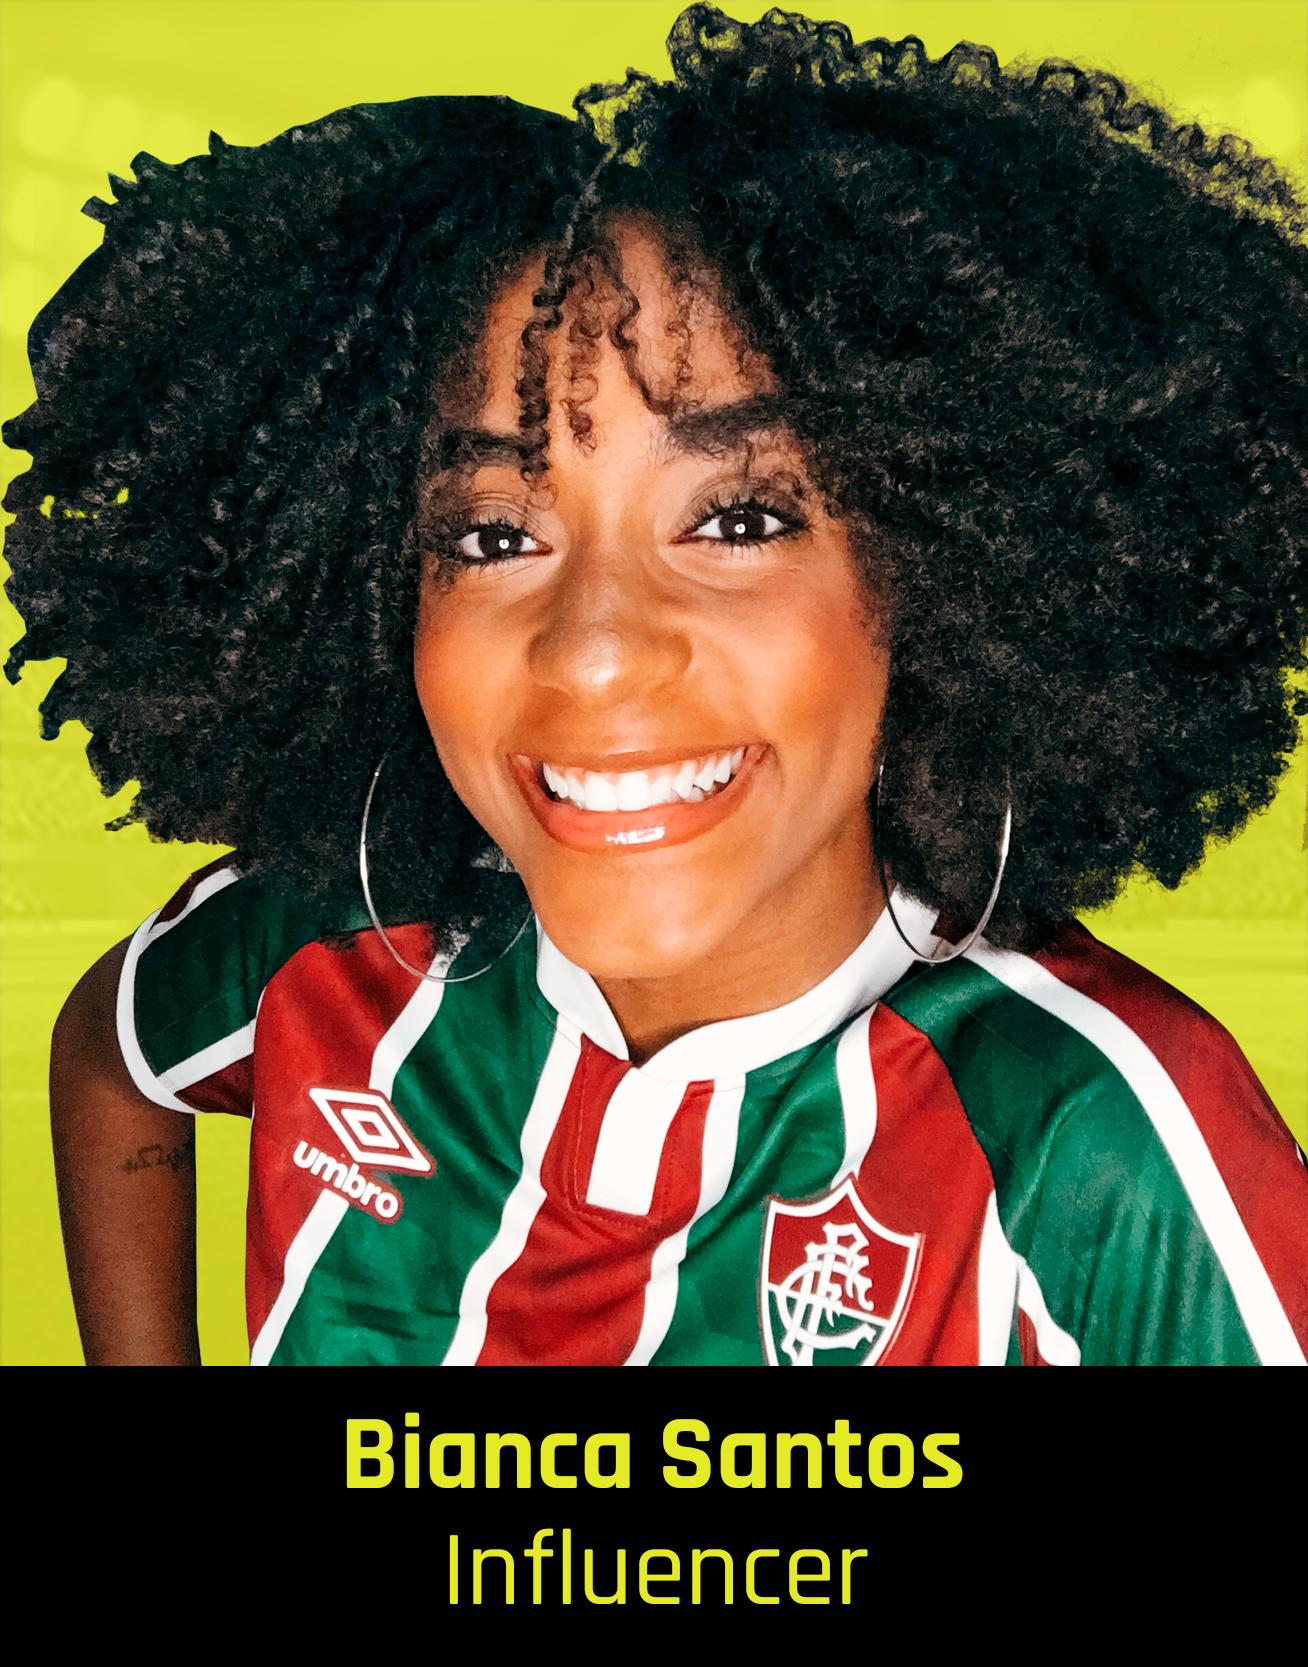 Bianca Santos